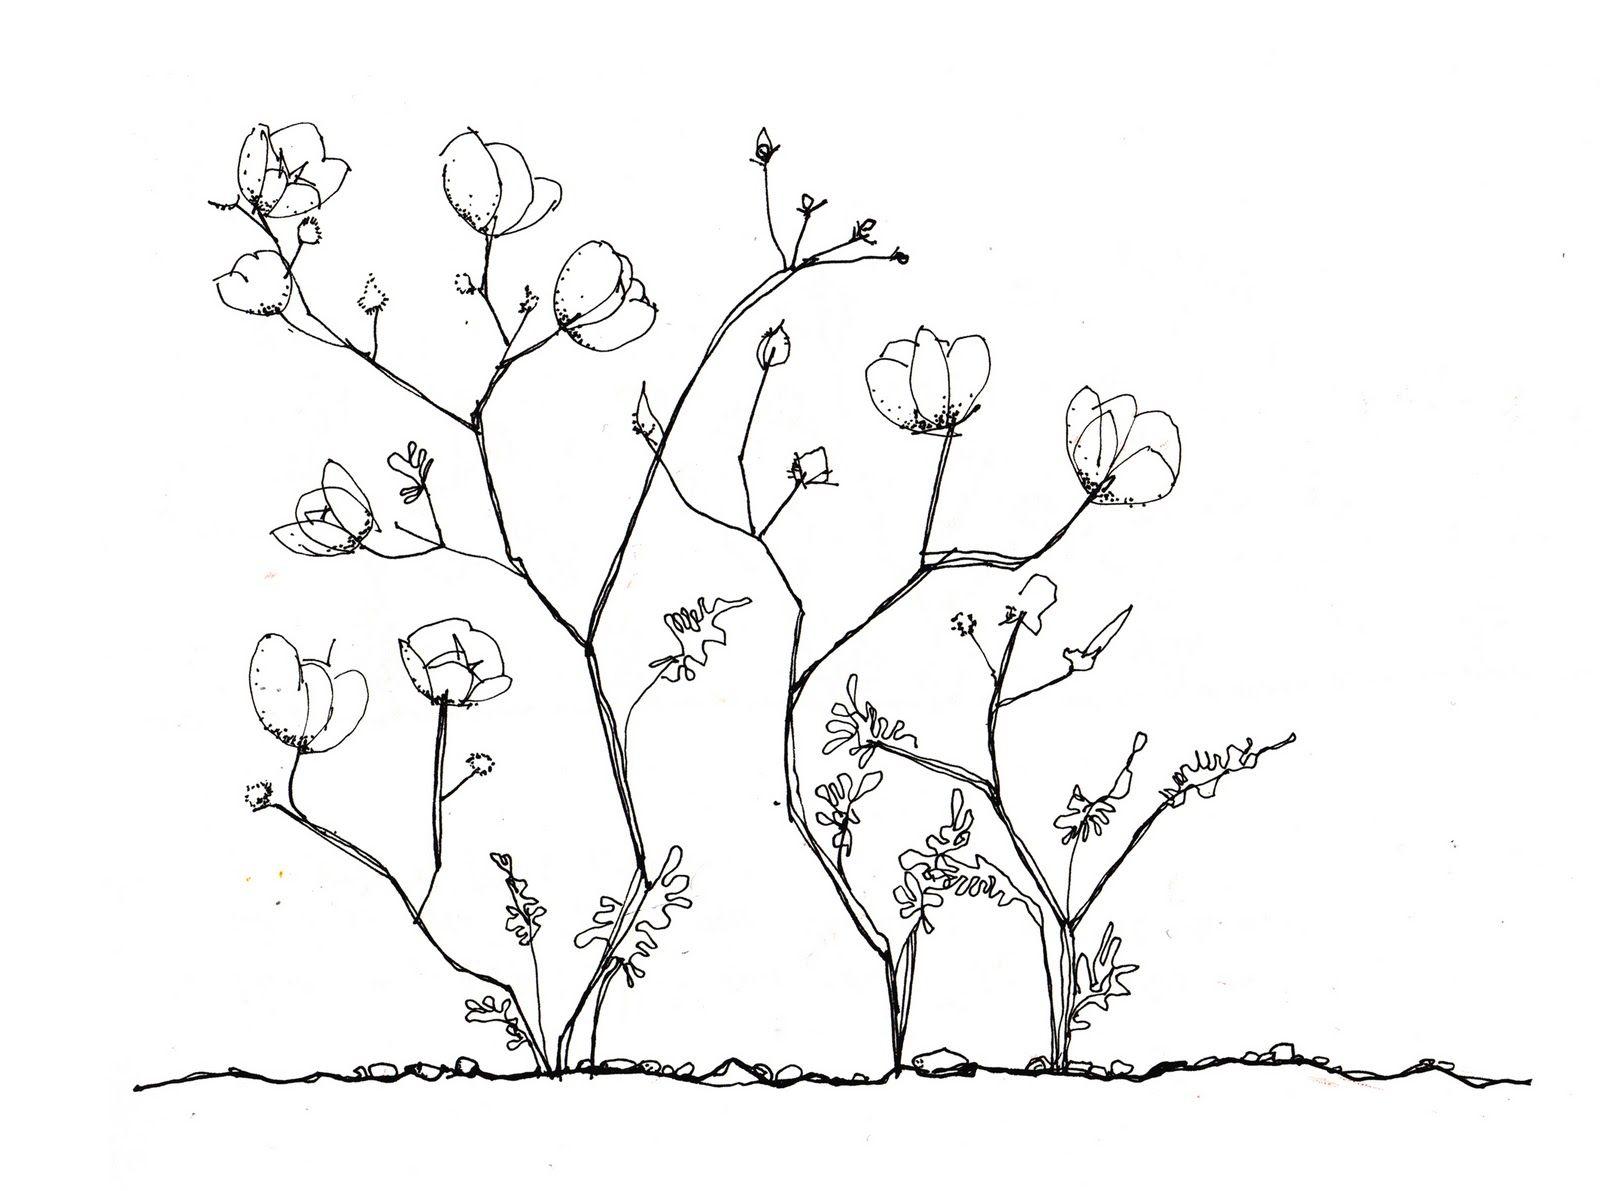 dibujo desierto florido  Buscar con Google  Interpretacin